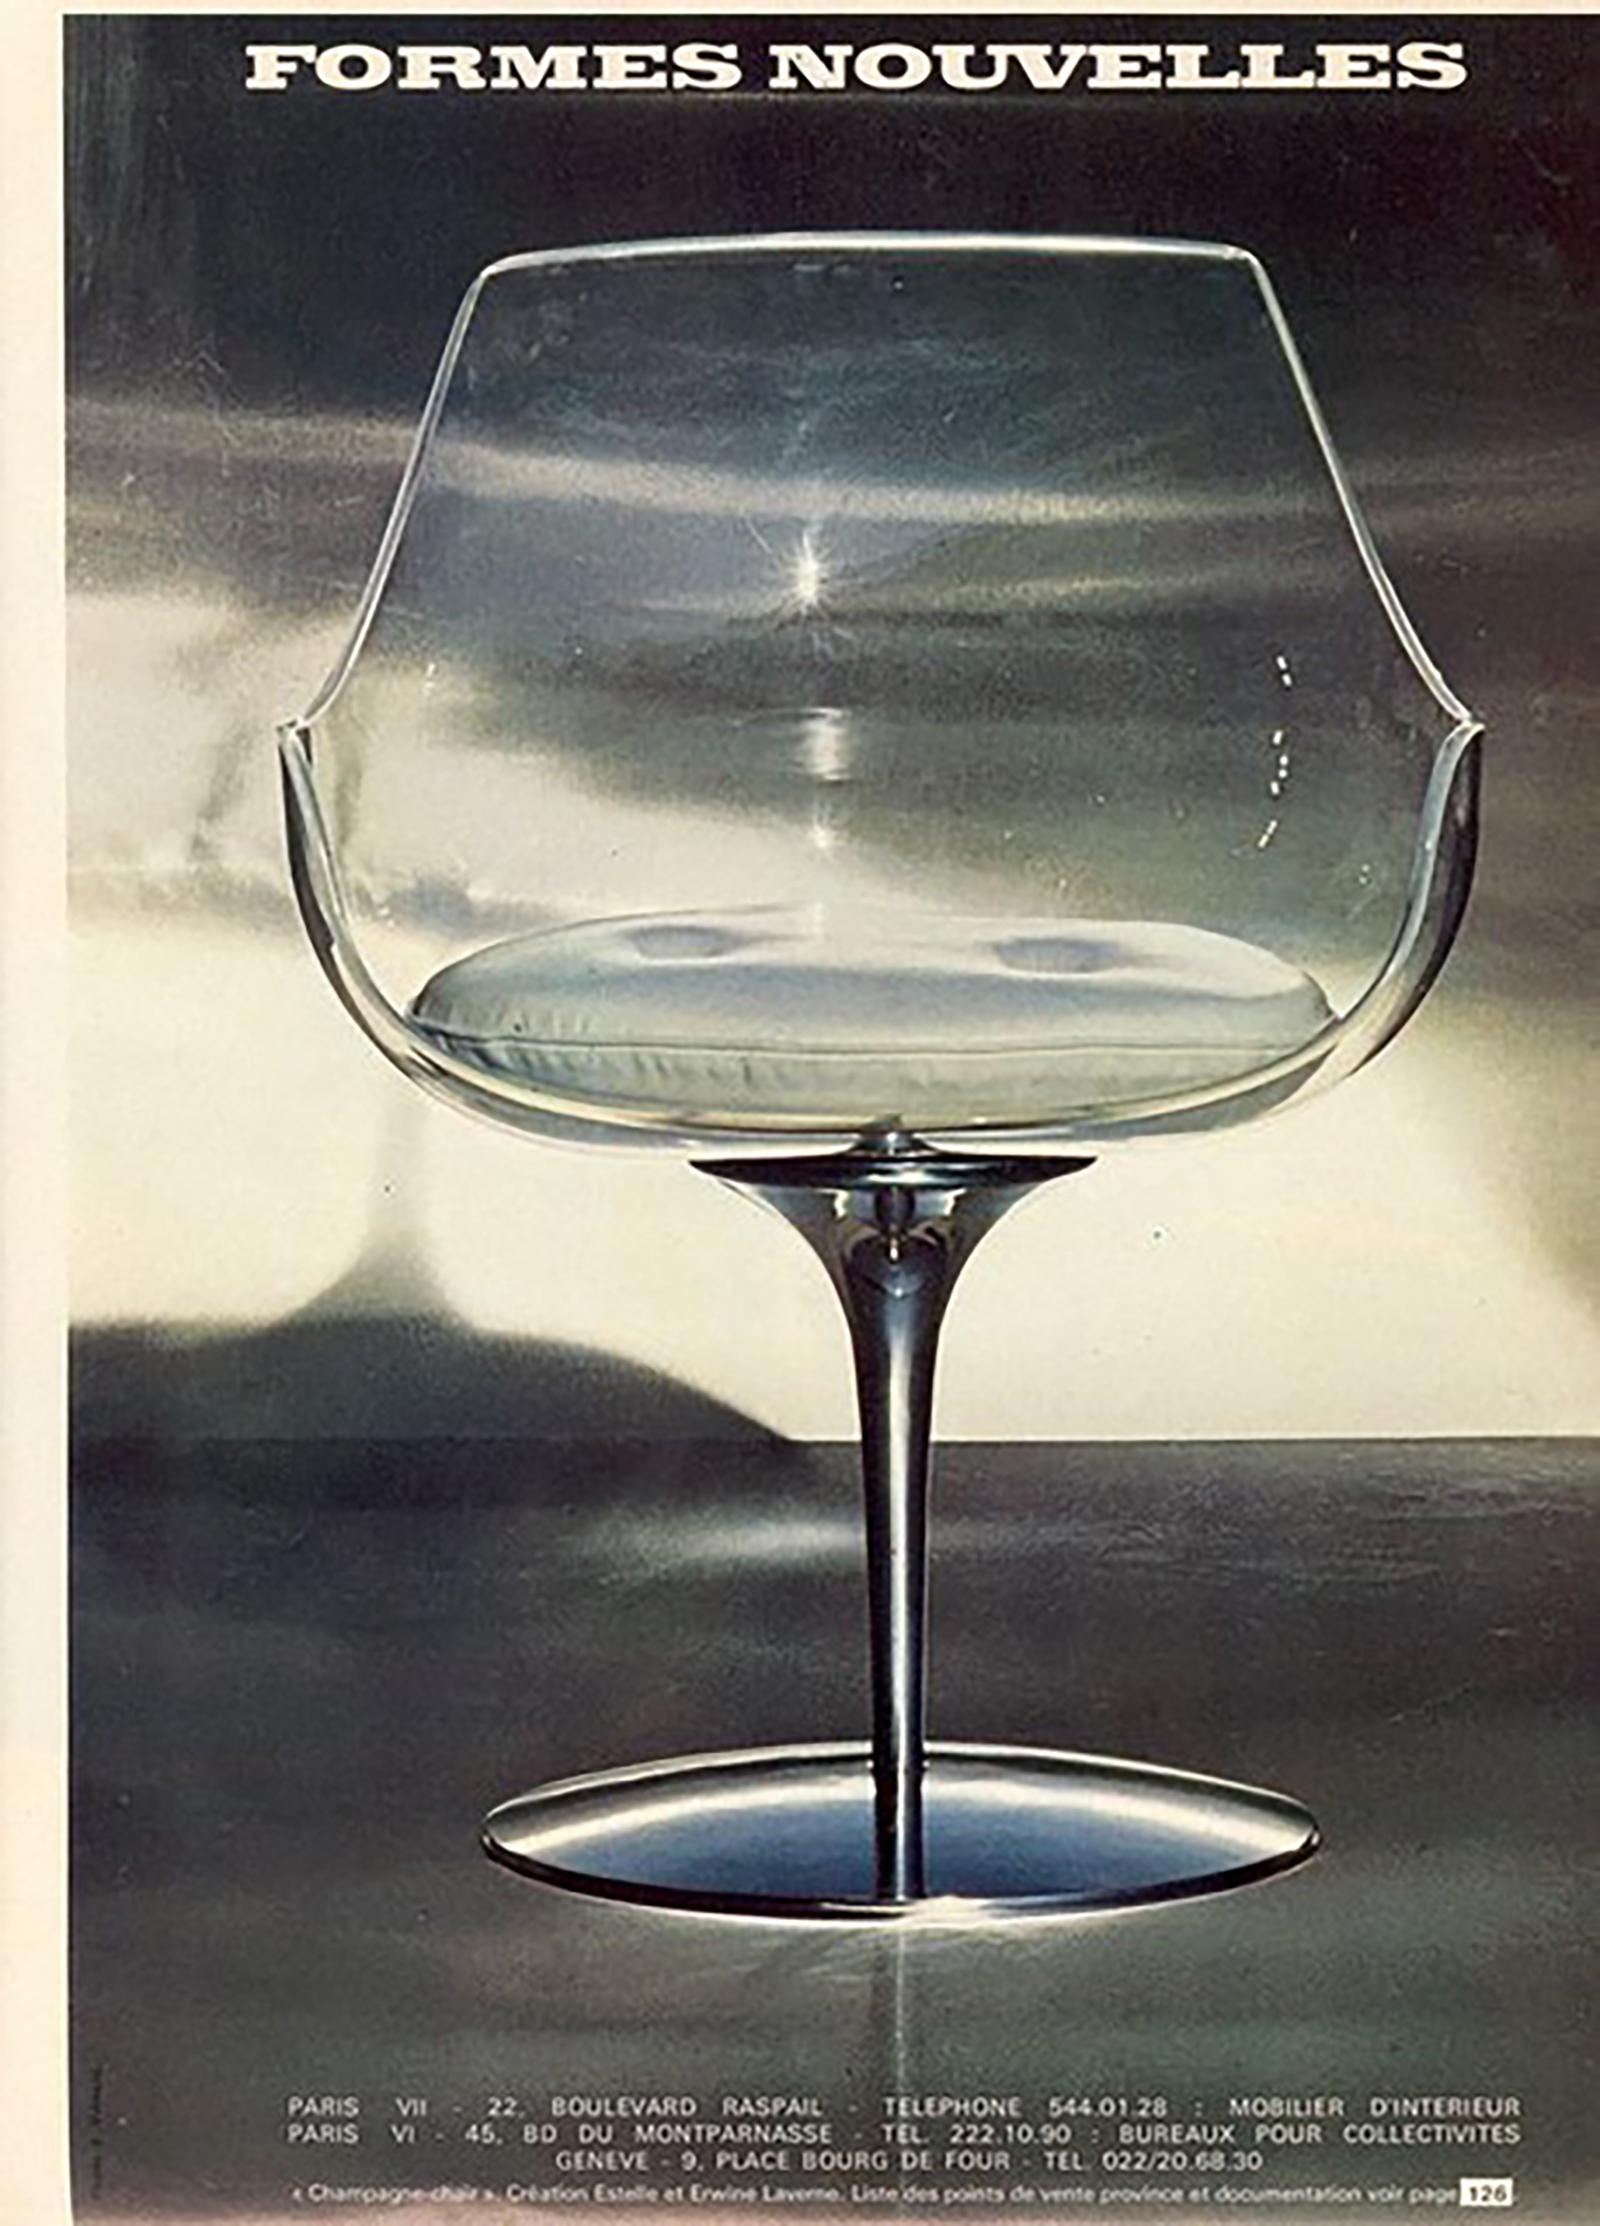 Laverne Champagne Chairs Formes Nouvellesimage 9